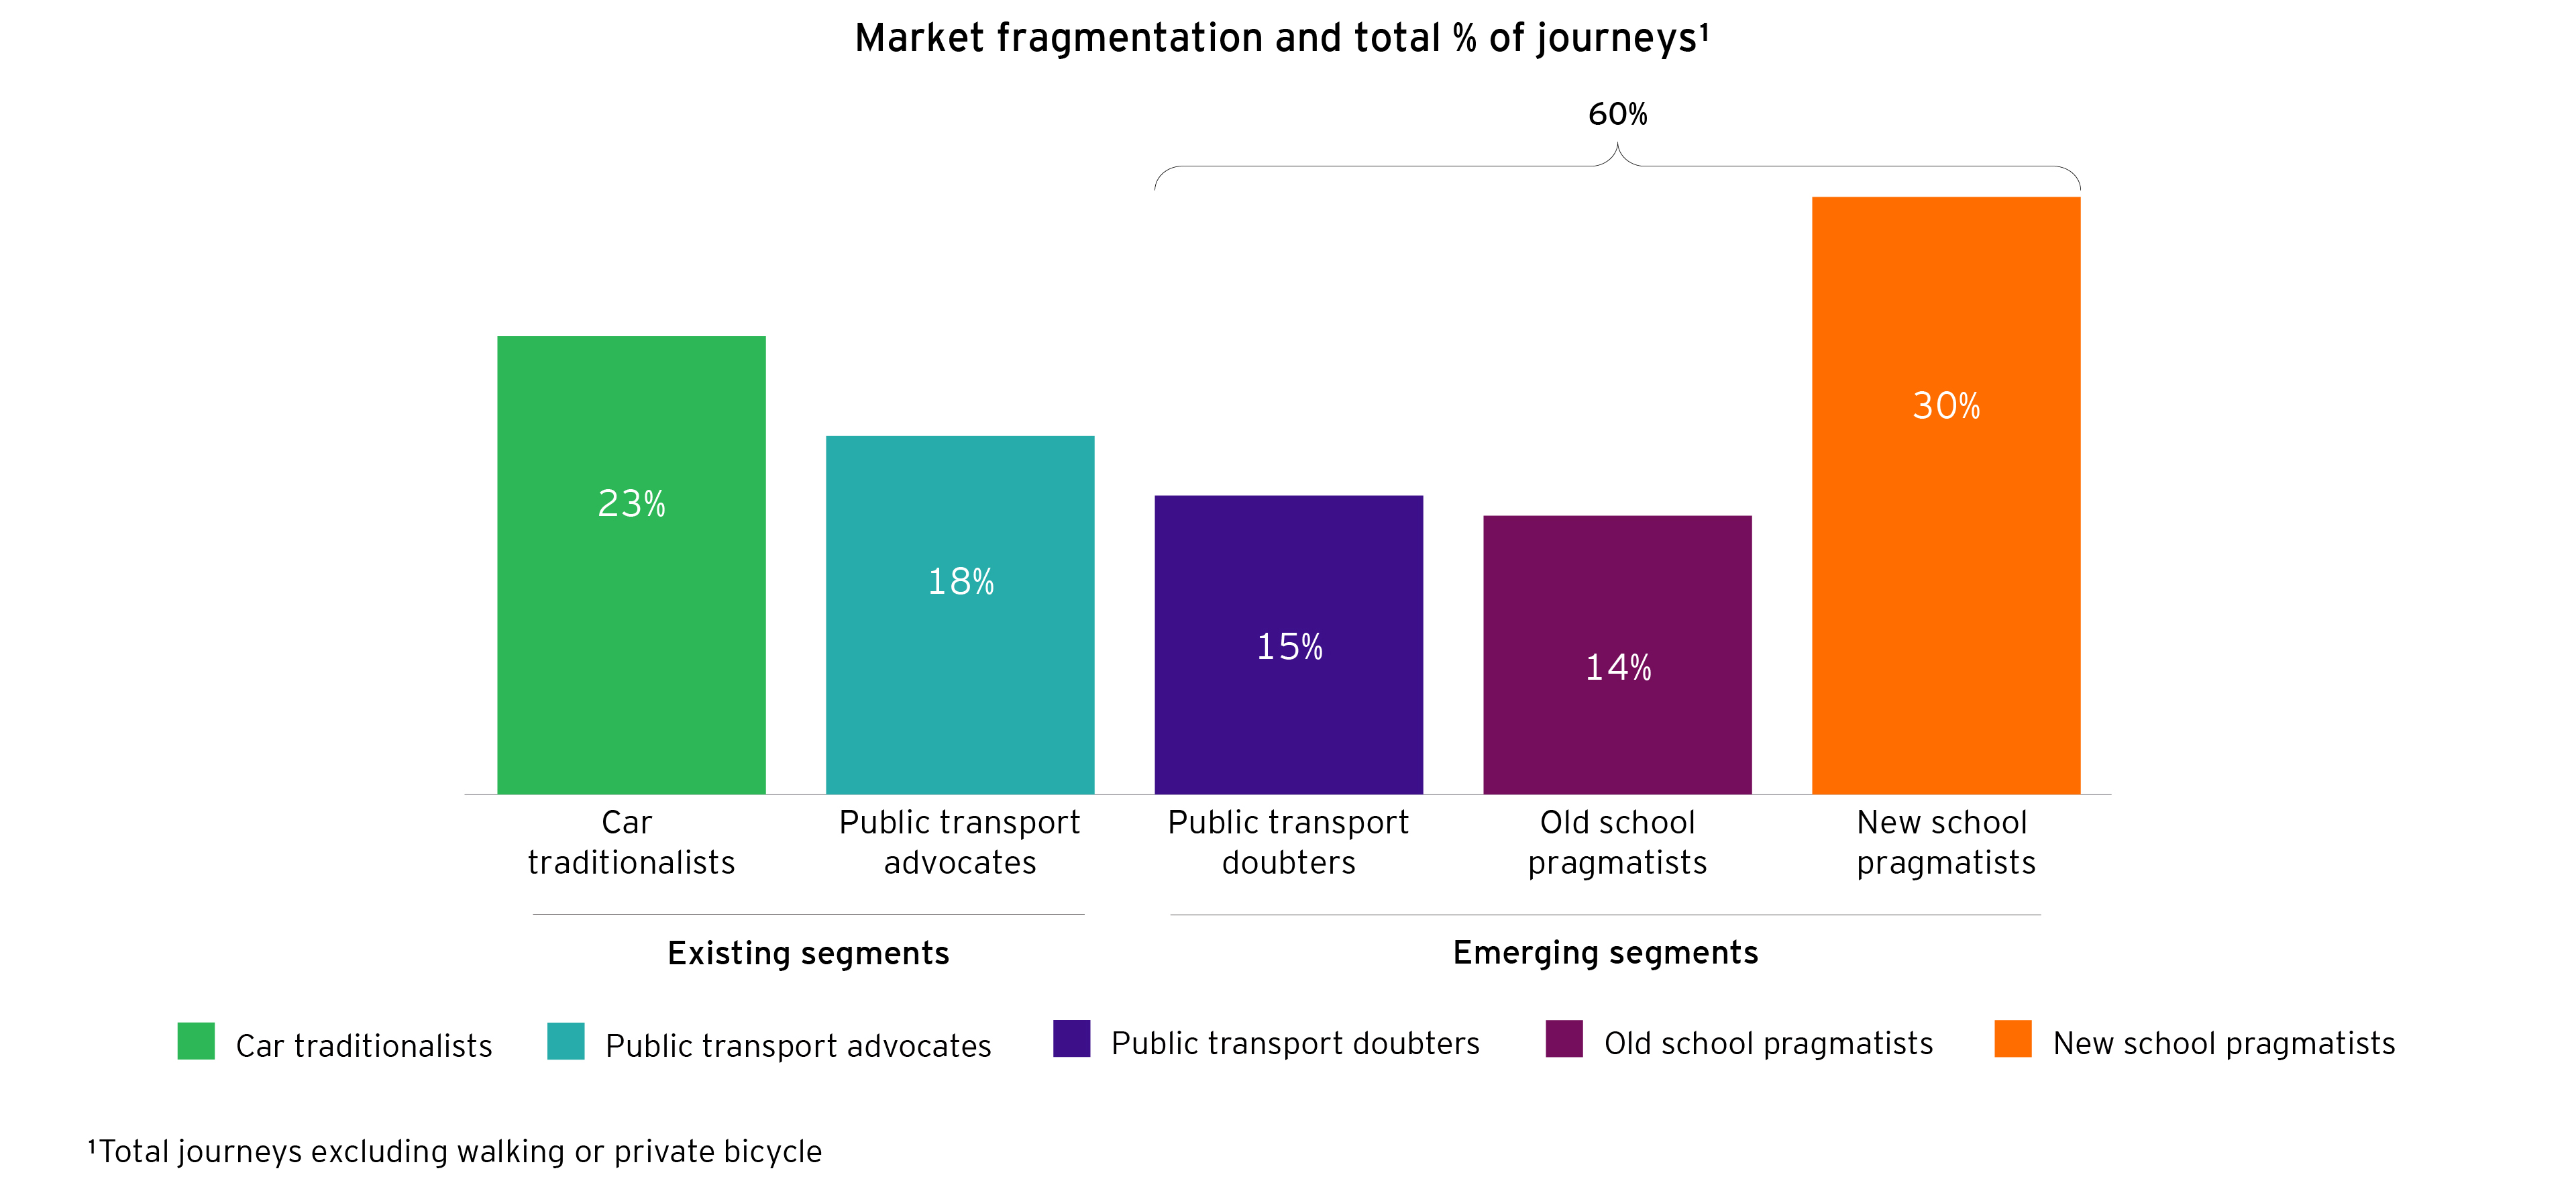 Market fragmentation and total % of journeys